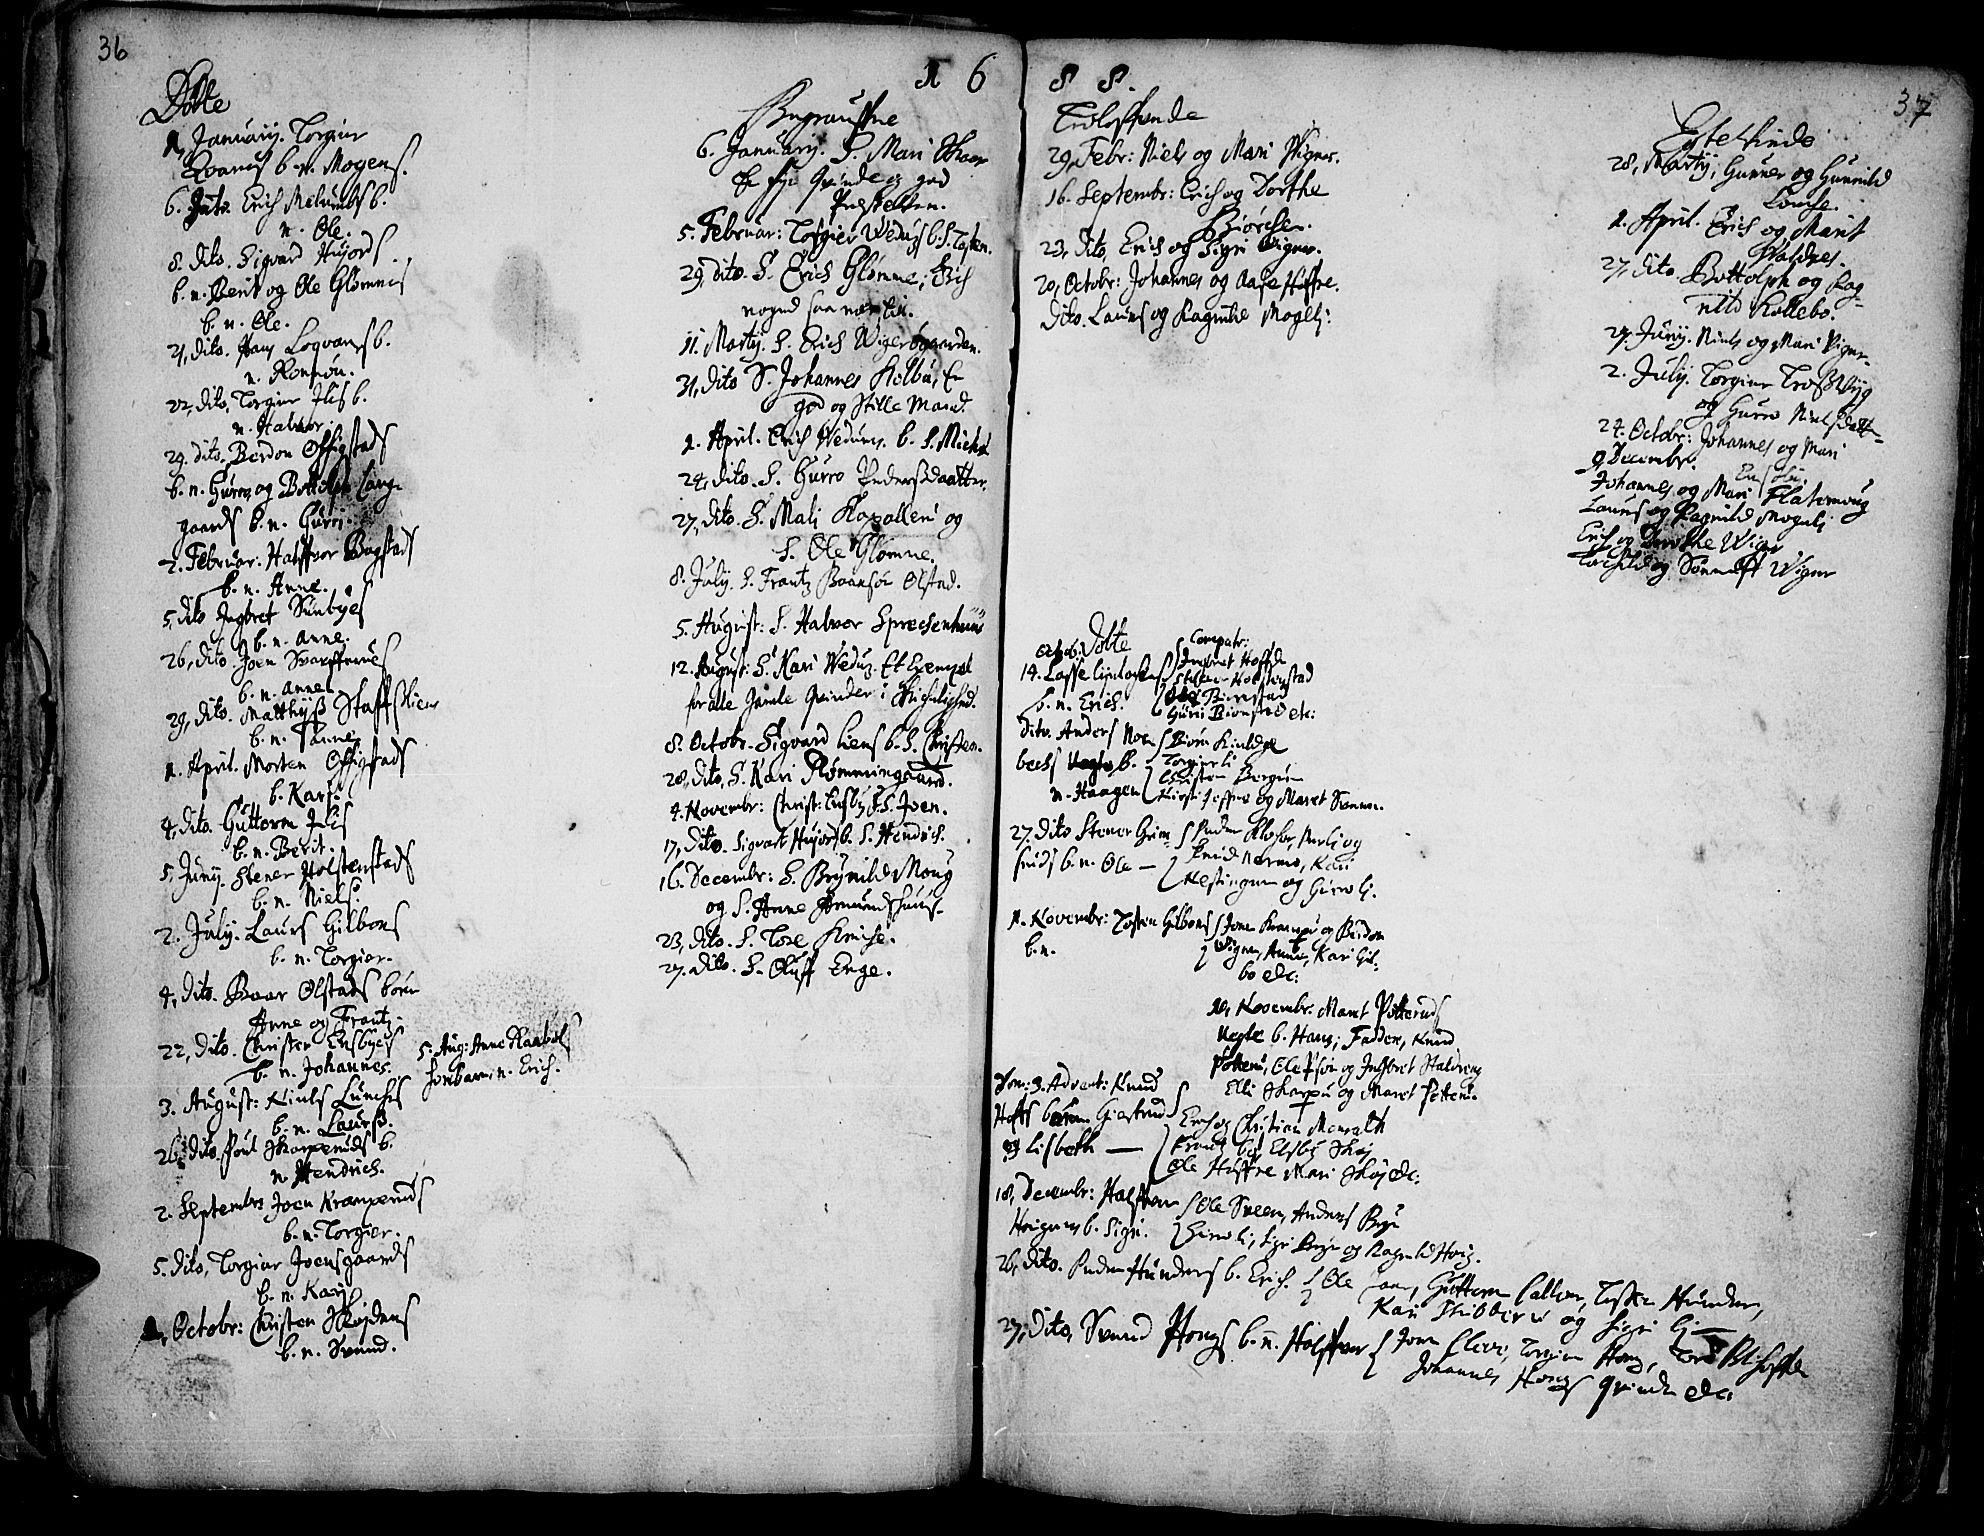 SAH, Øyer prestekontor, Ministerialbok nr. 1, 1671-1727, s. 36-37